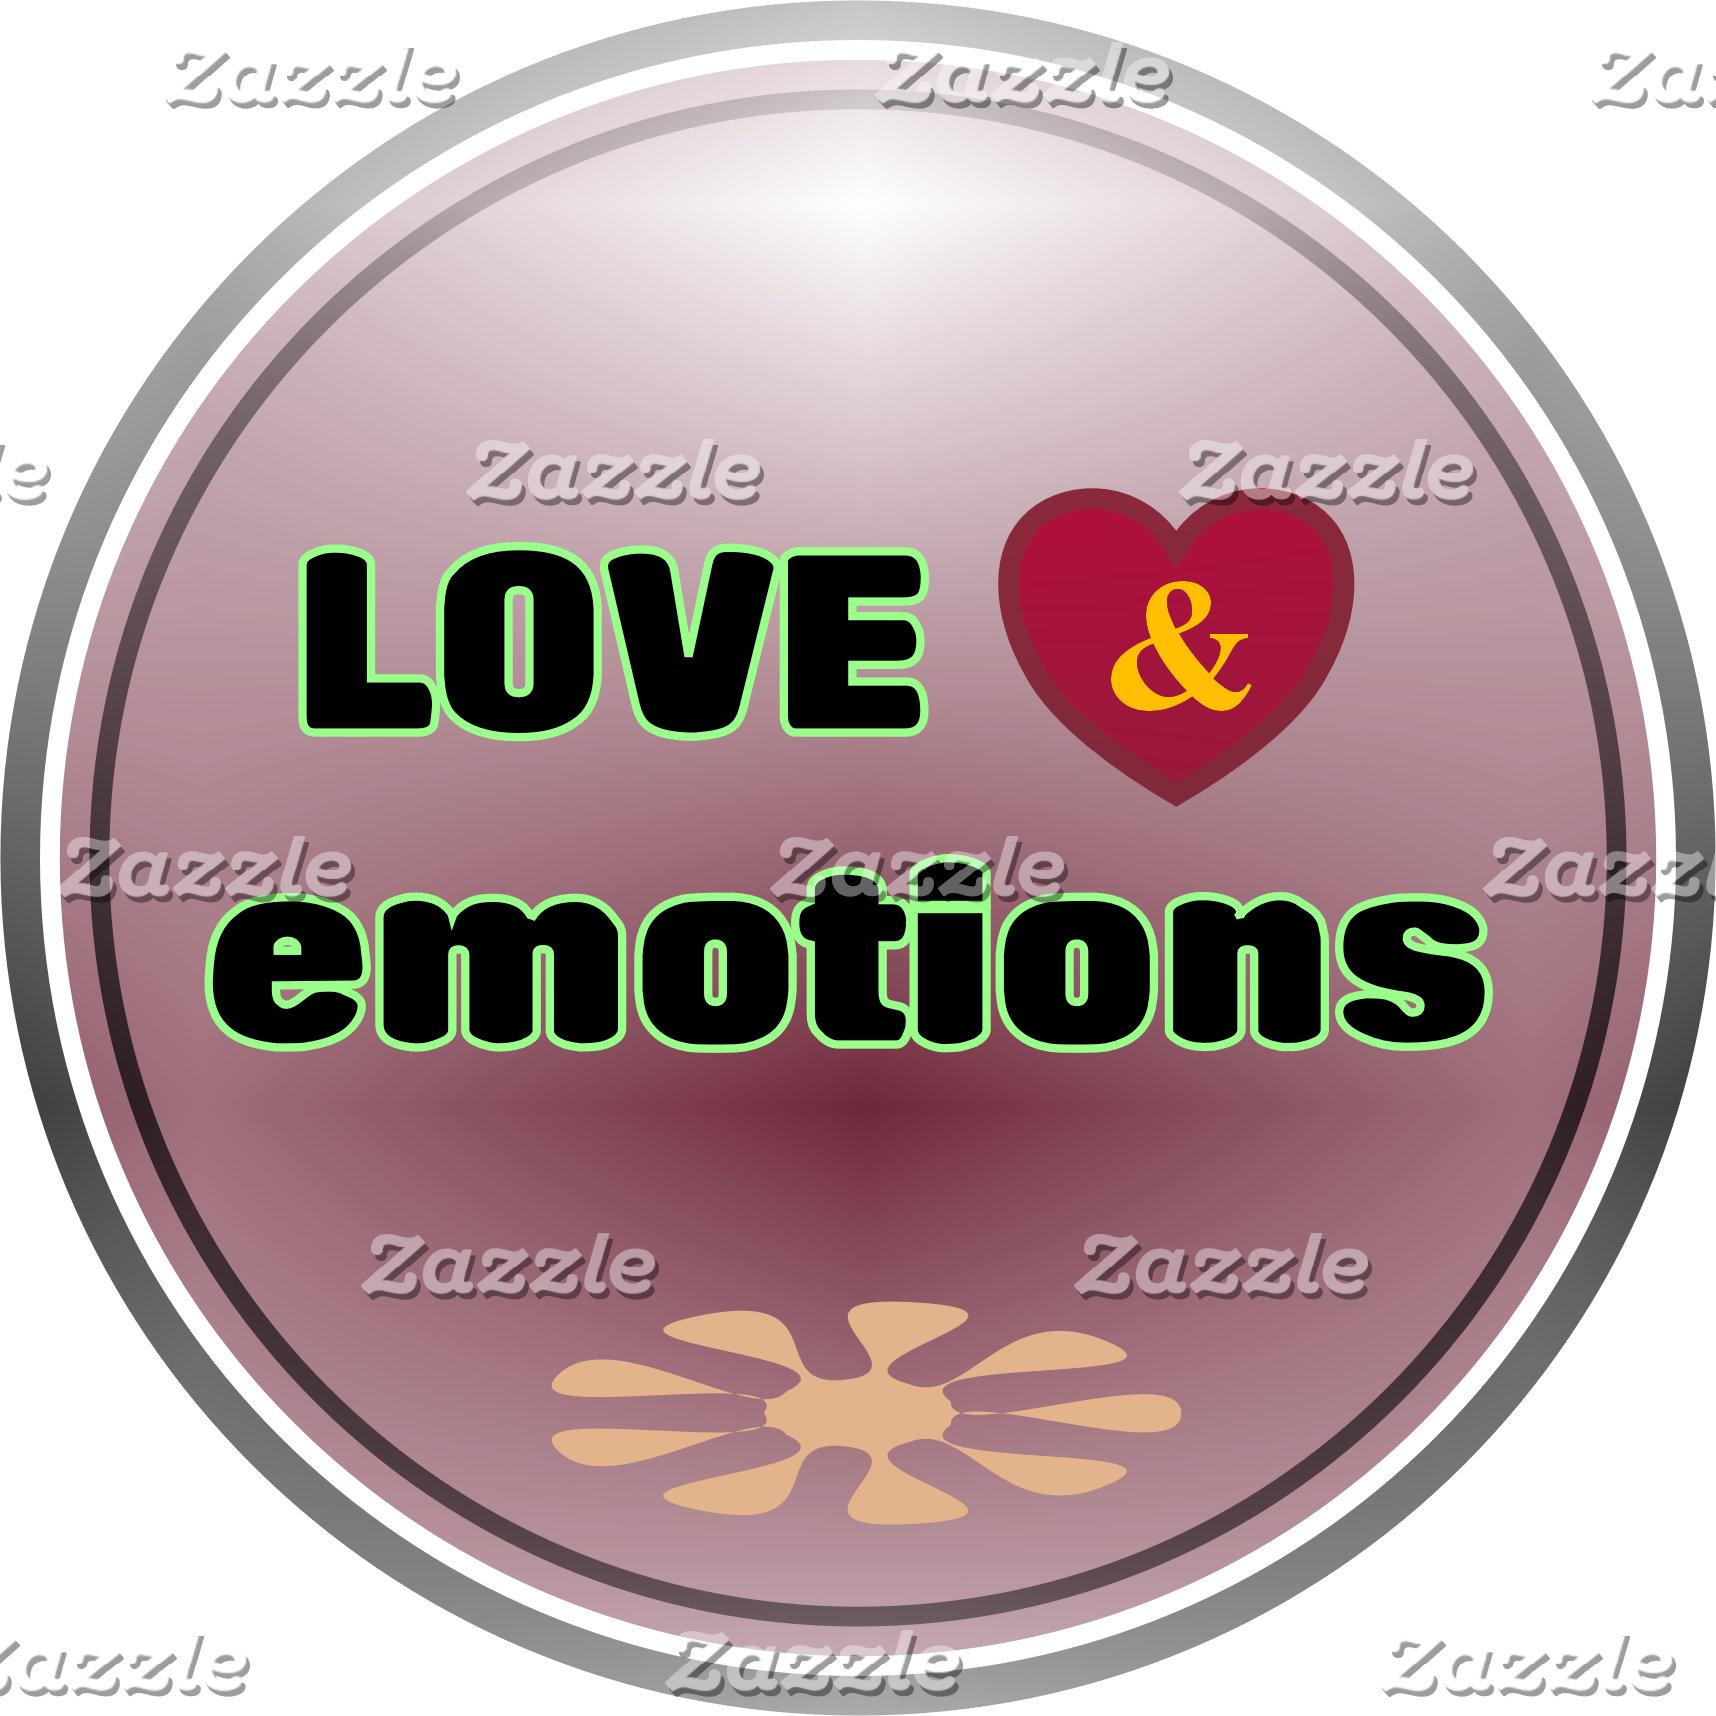 Love & emotions